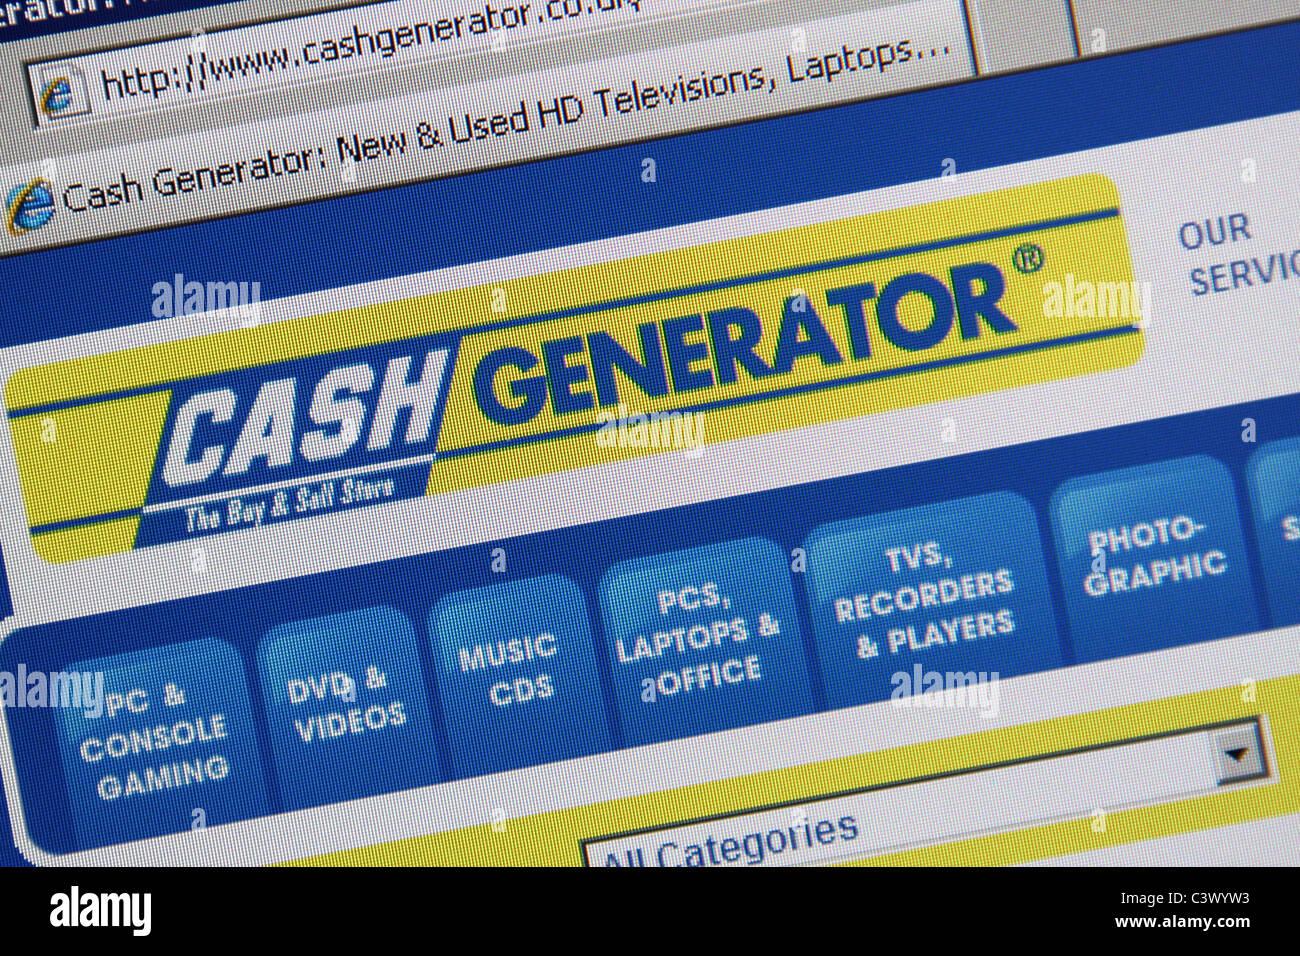 cash generator website screenshot - Stock Image